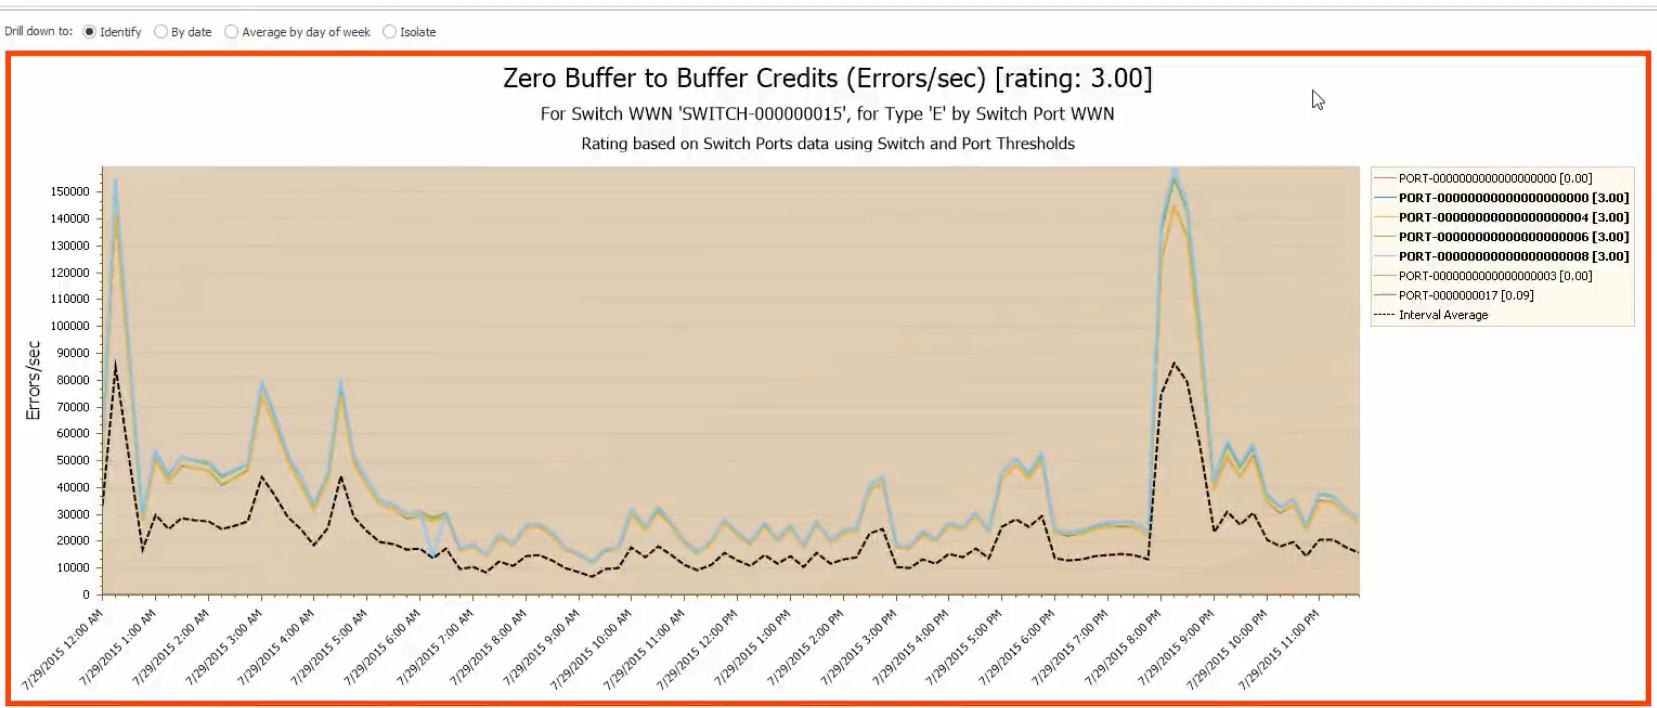 Zero Buffer to Buffer Credits